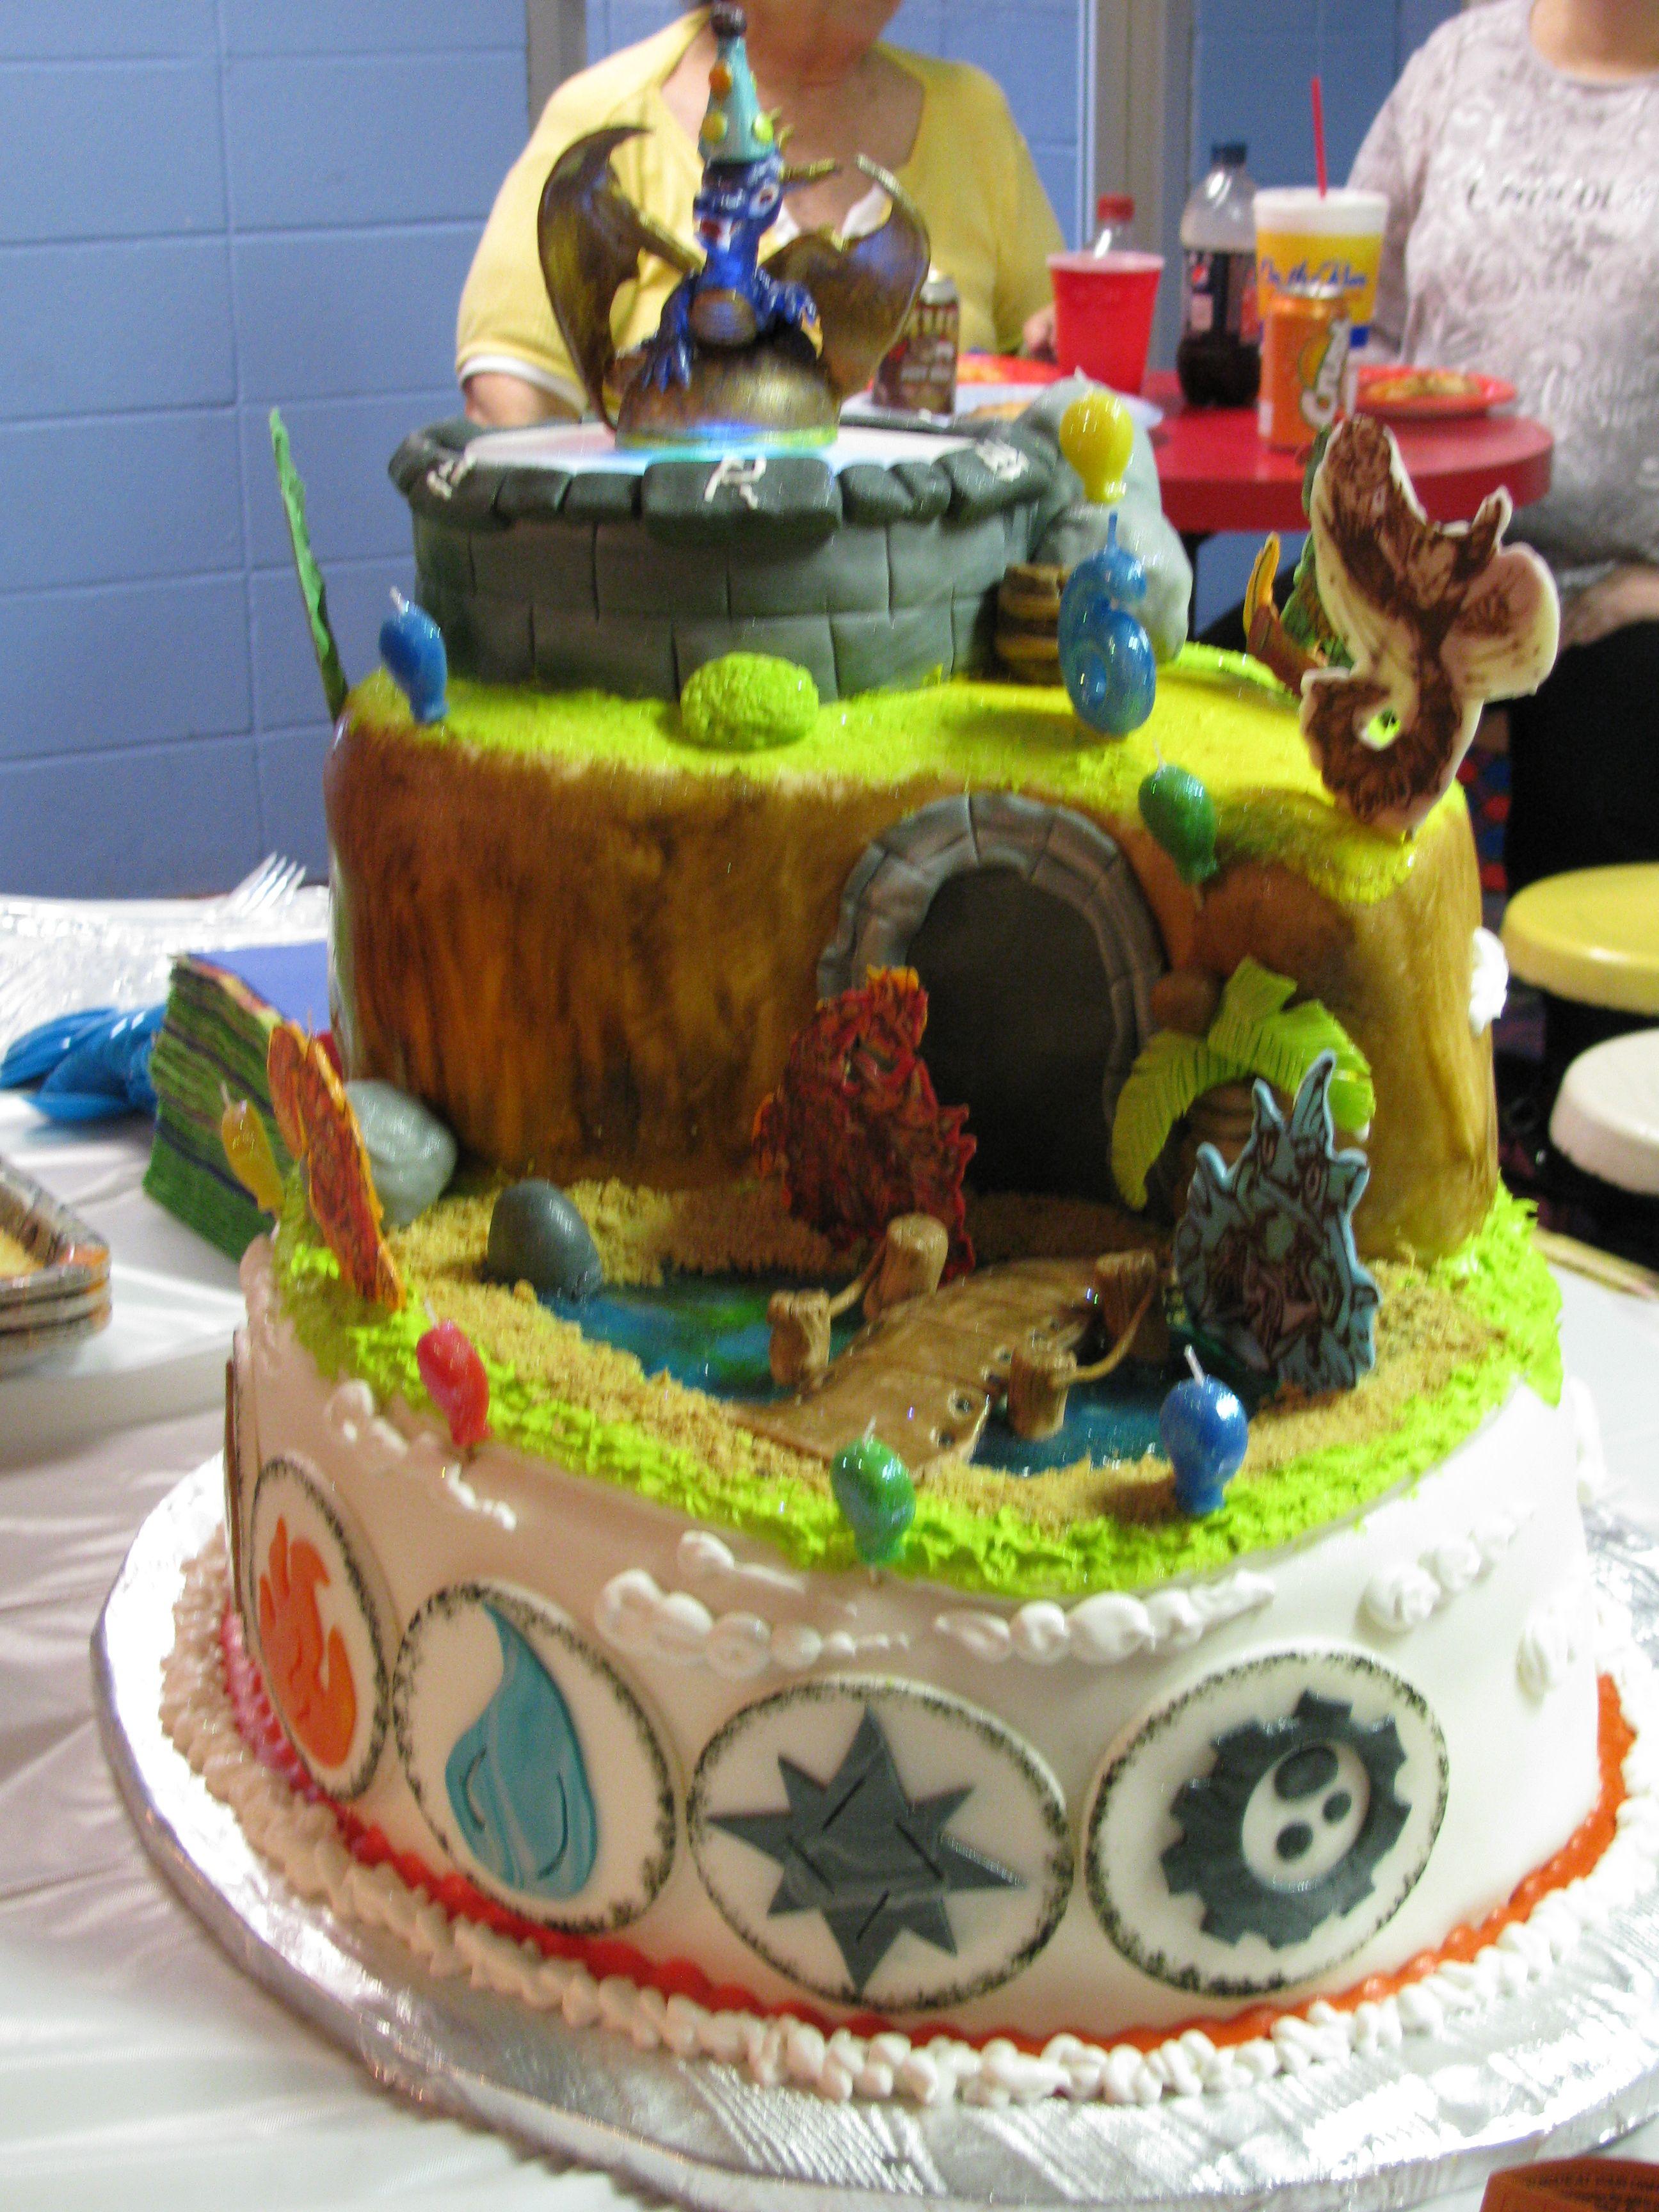 My sons 6th Birthday CakeSkylanders Spyros AdventureAll